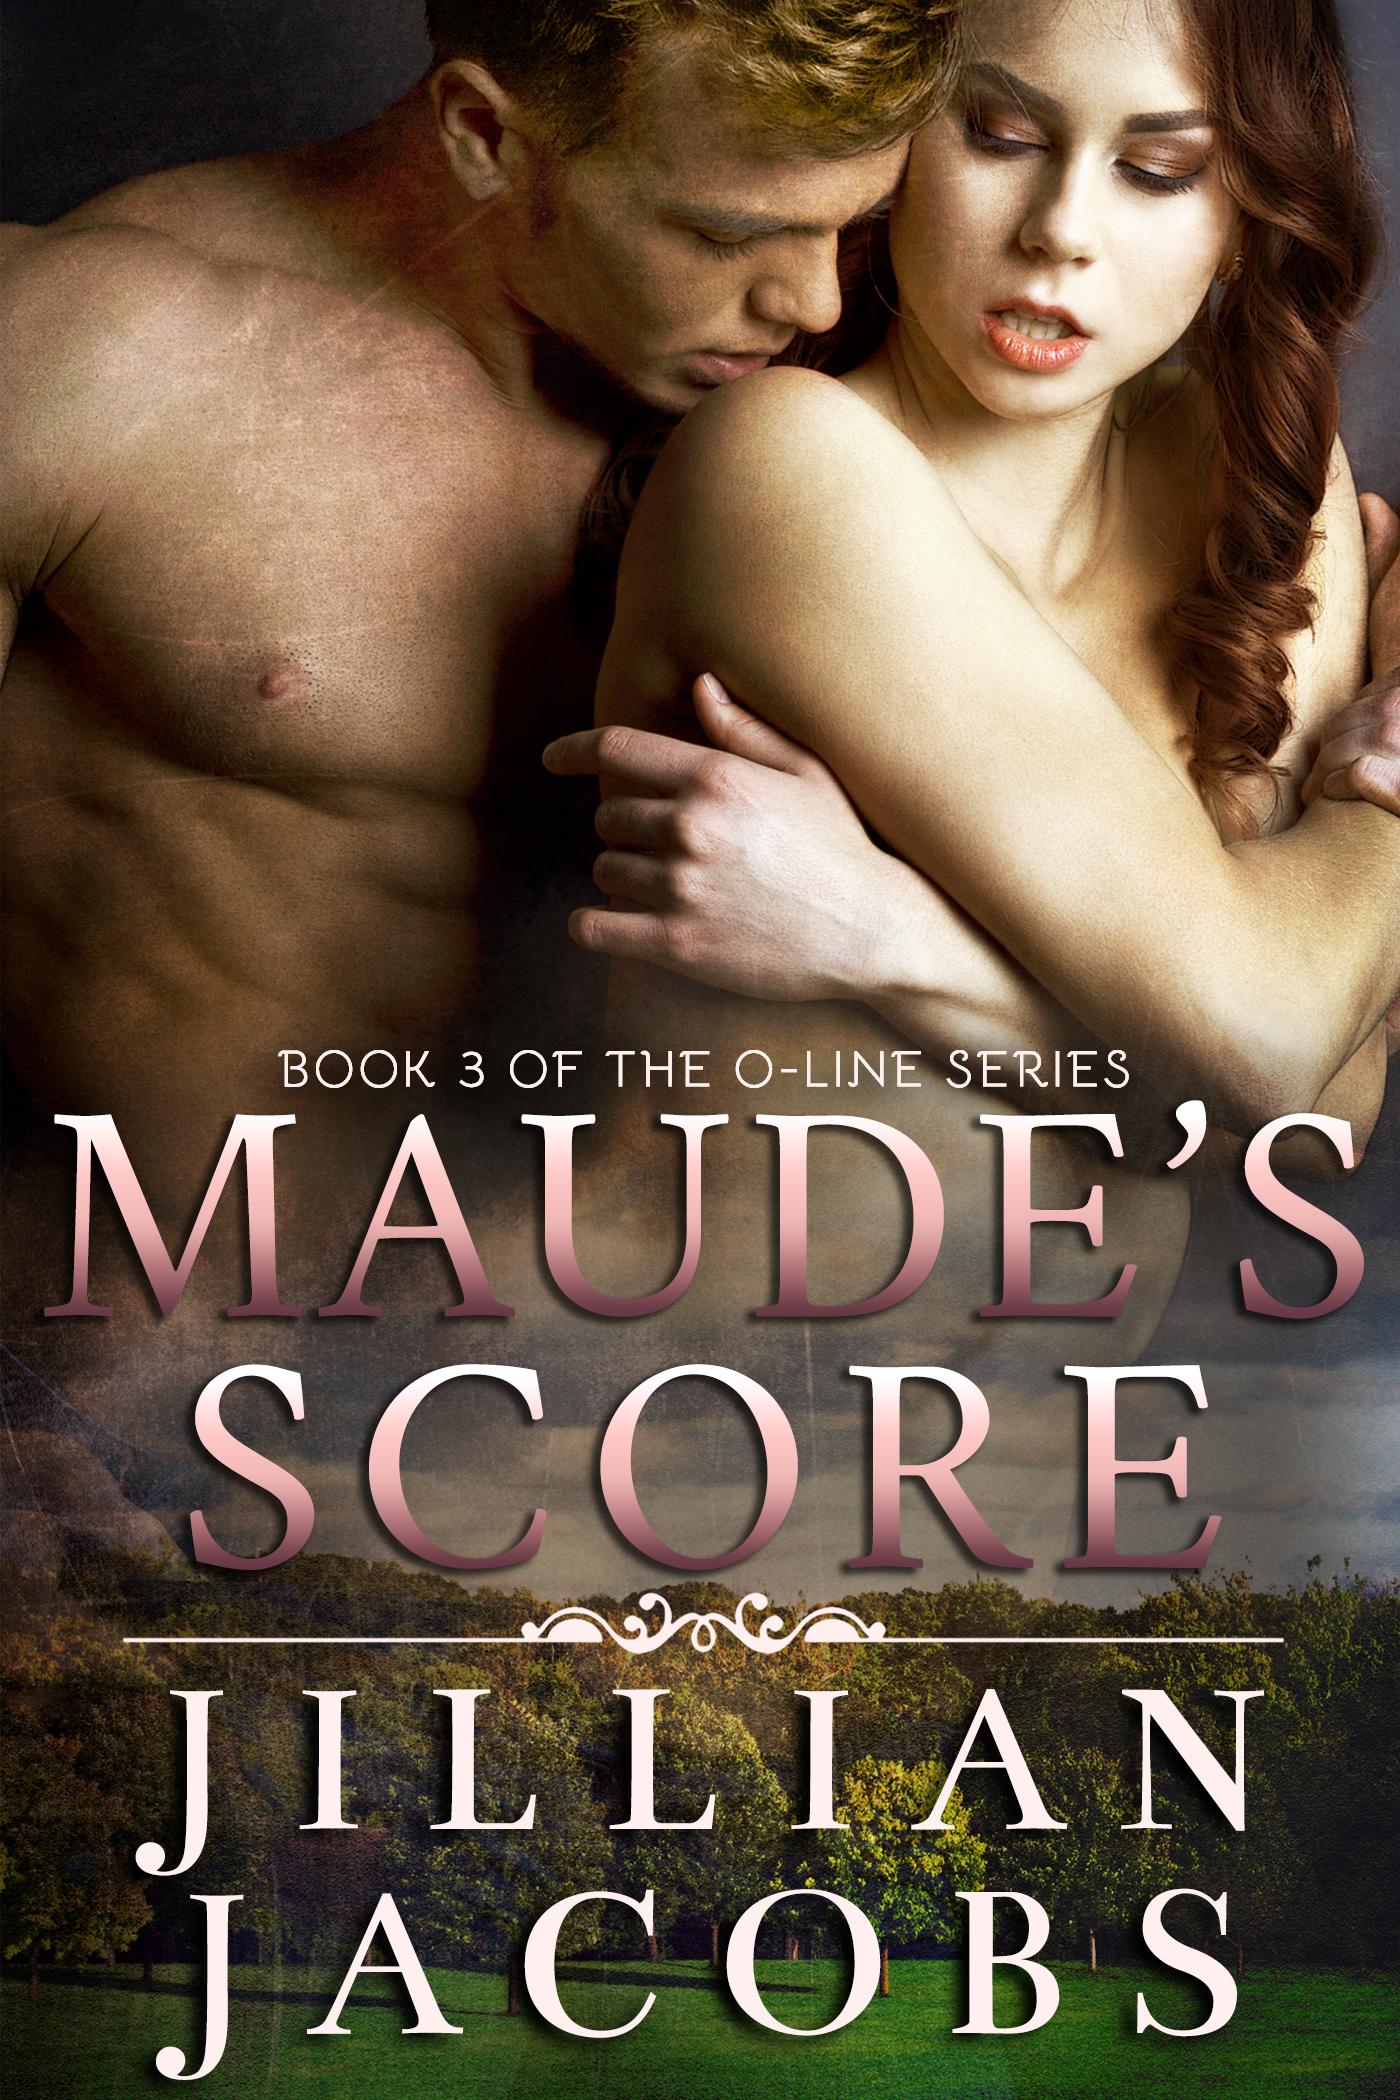 MediaKit_BookCover_MaudesScore